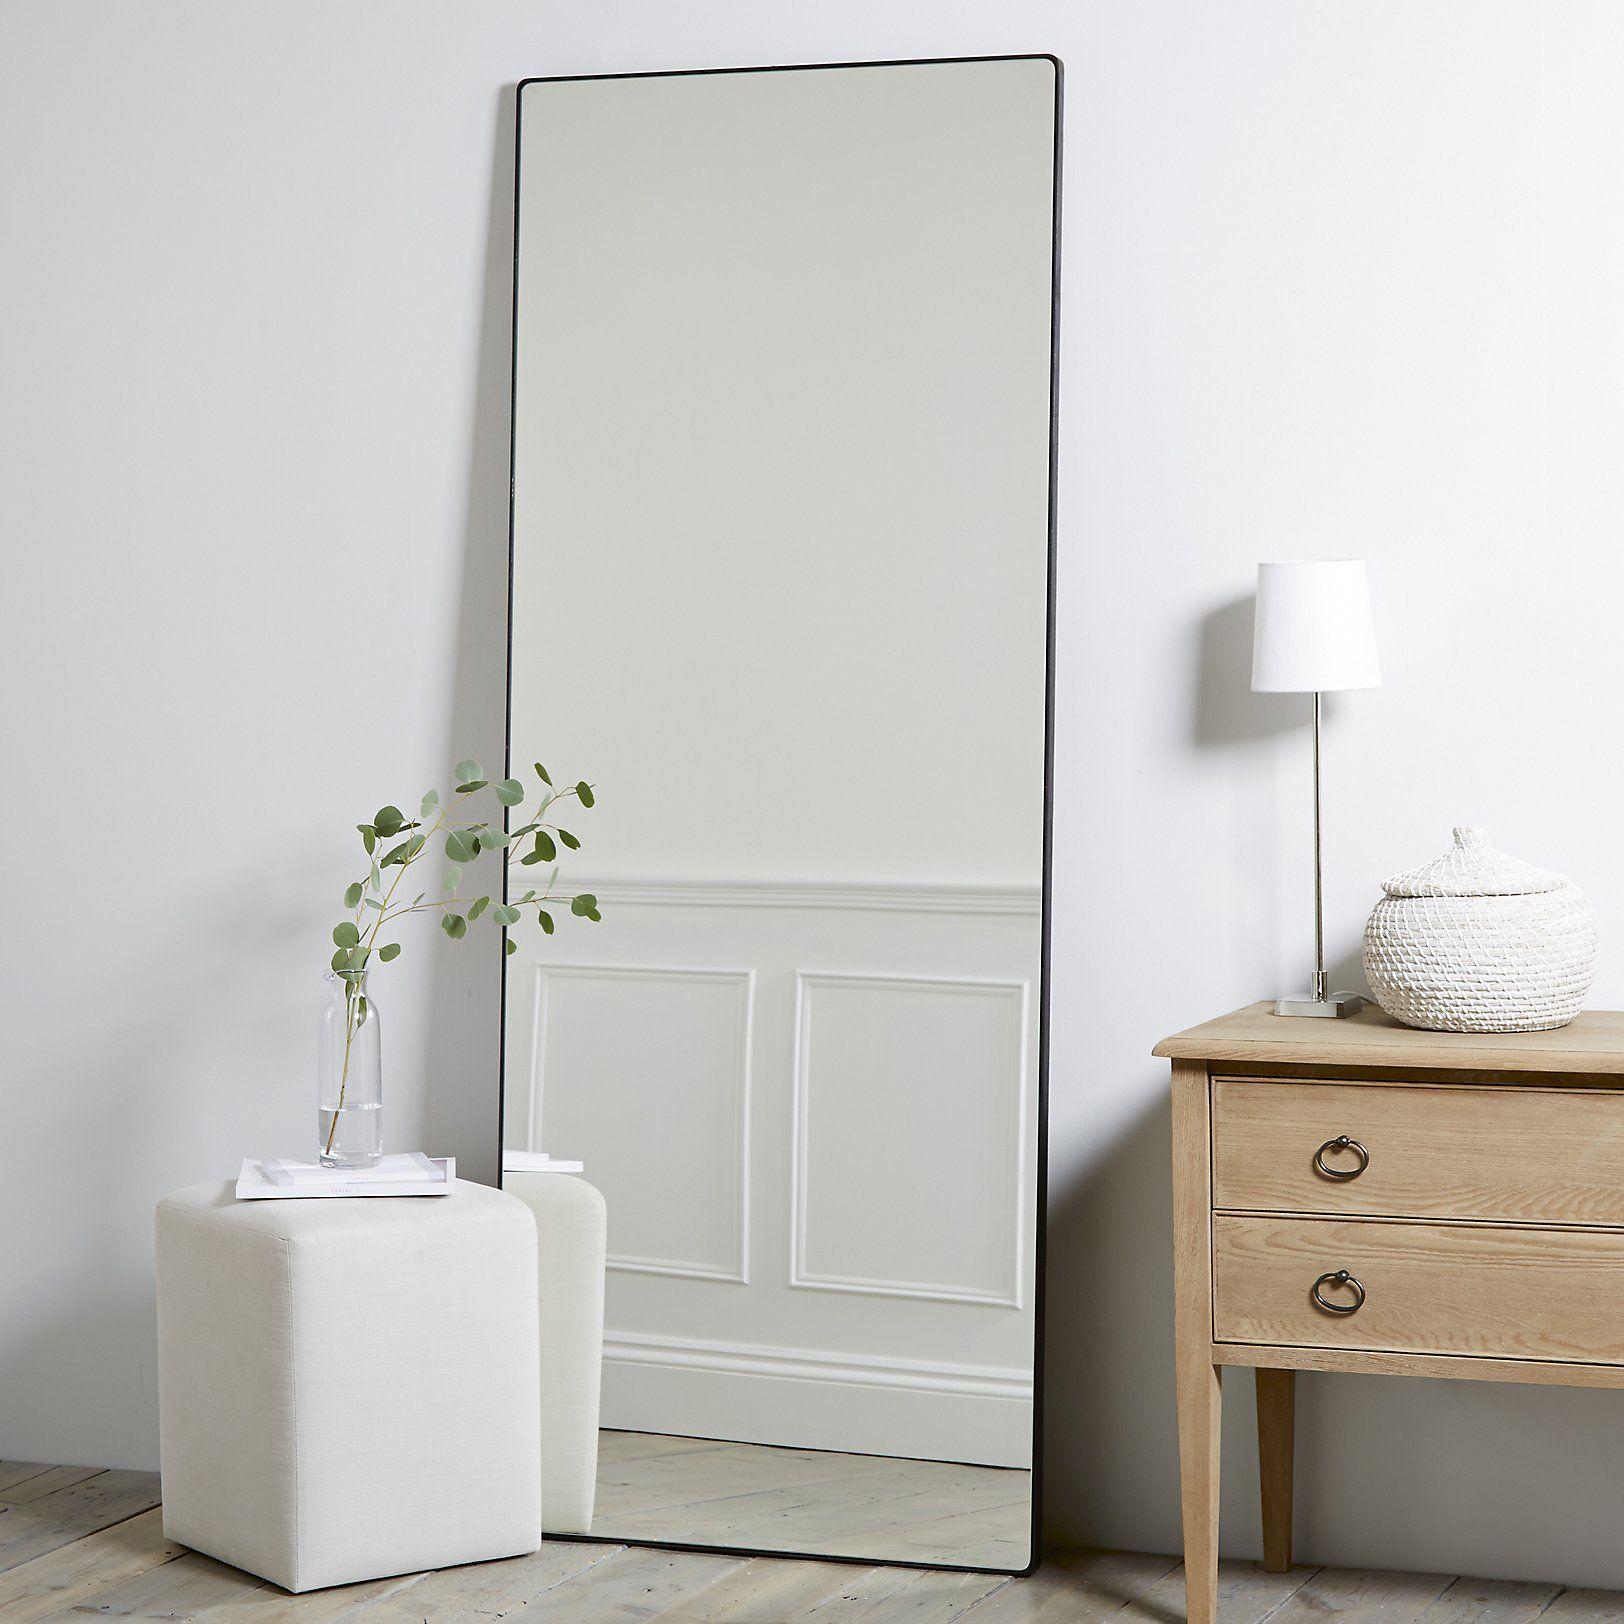 Chiltern Thin Metal Rectangular Mirror   The White Company UK. Chiltern Thin Metal Rectangular Mirror   The White Company UK